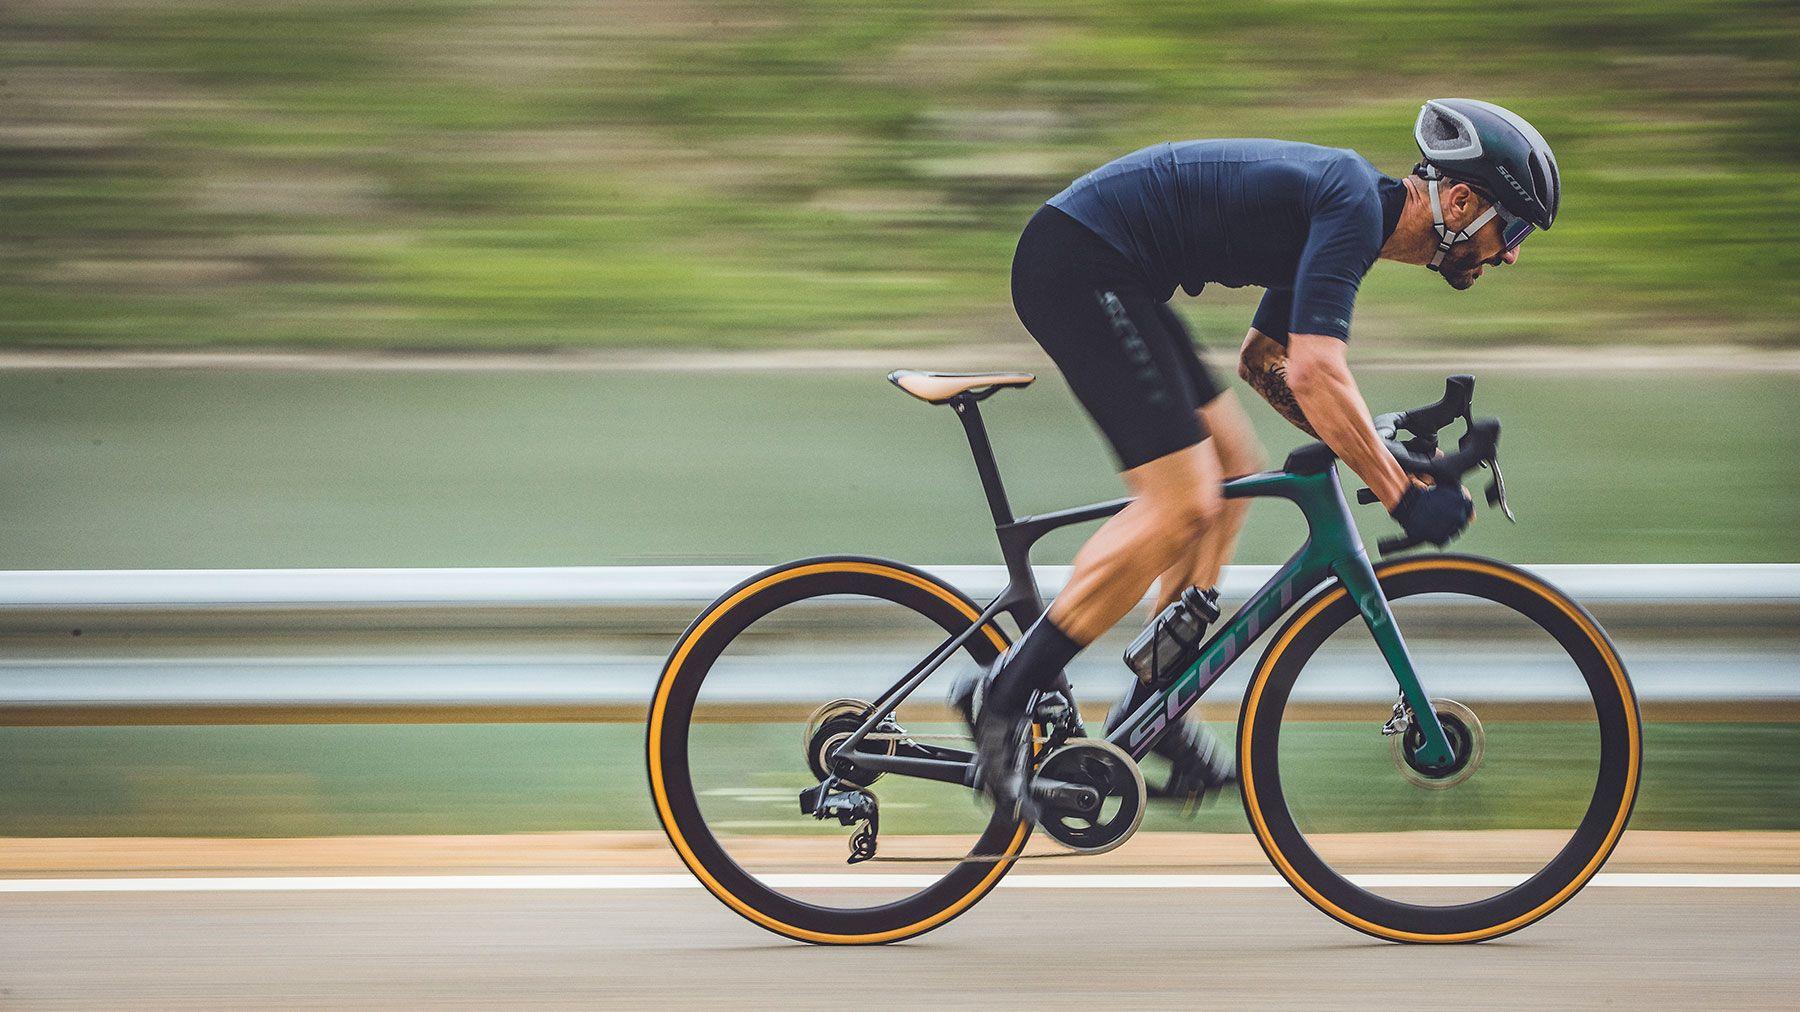 Foil Win Every Ride Scott Sports In 2020 Scott Sports Bike News Scott Bikes